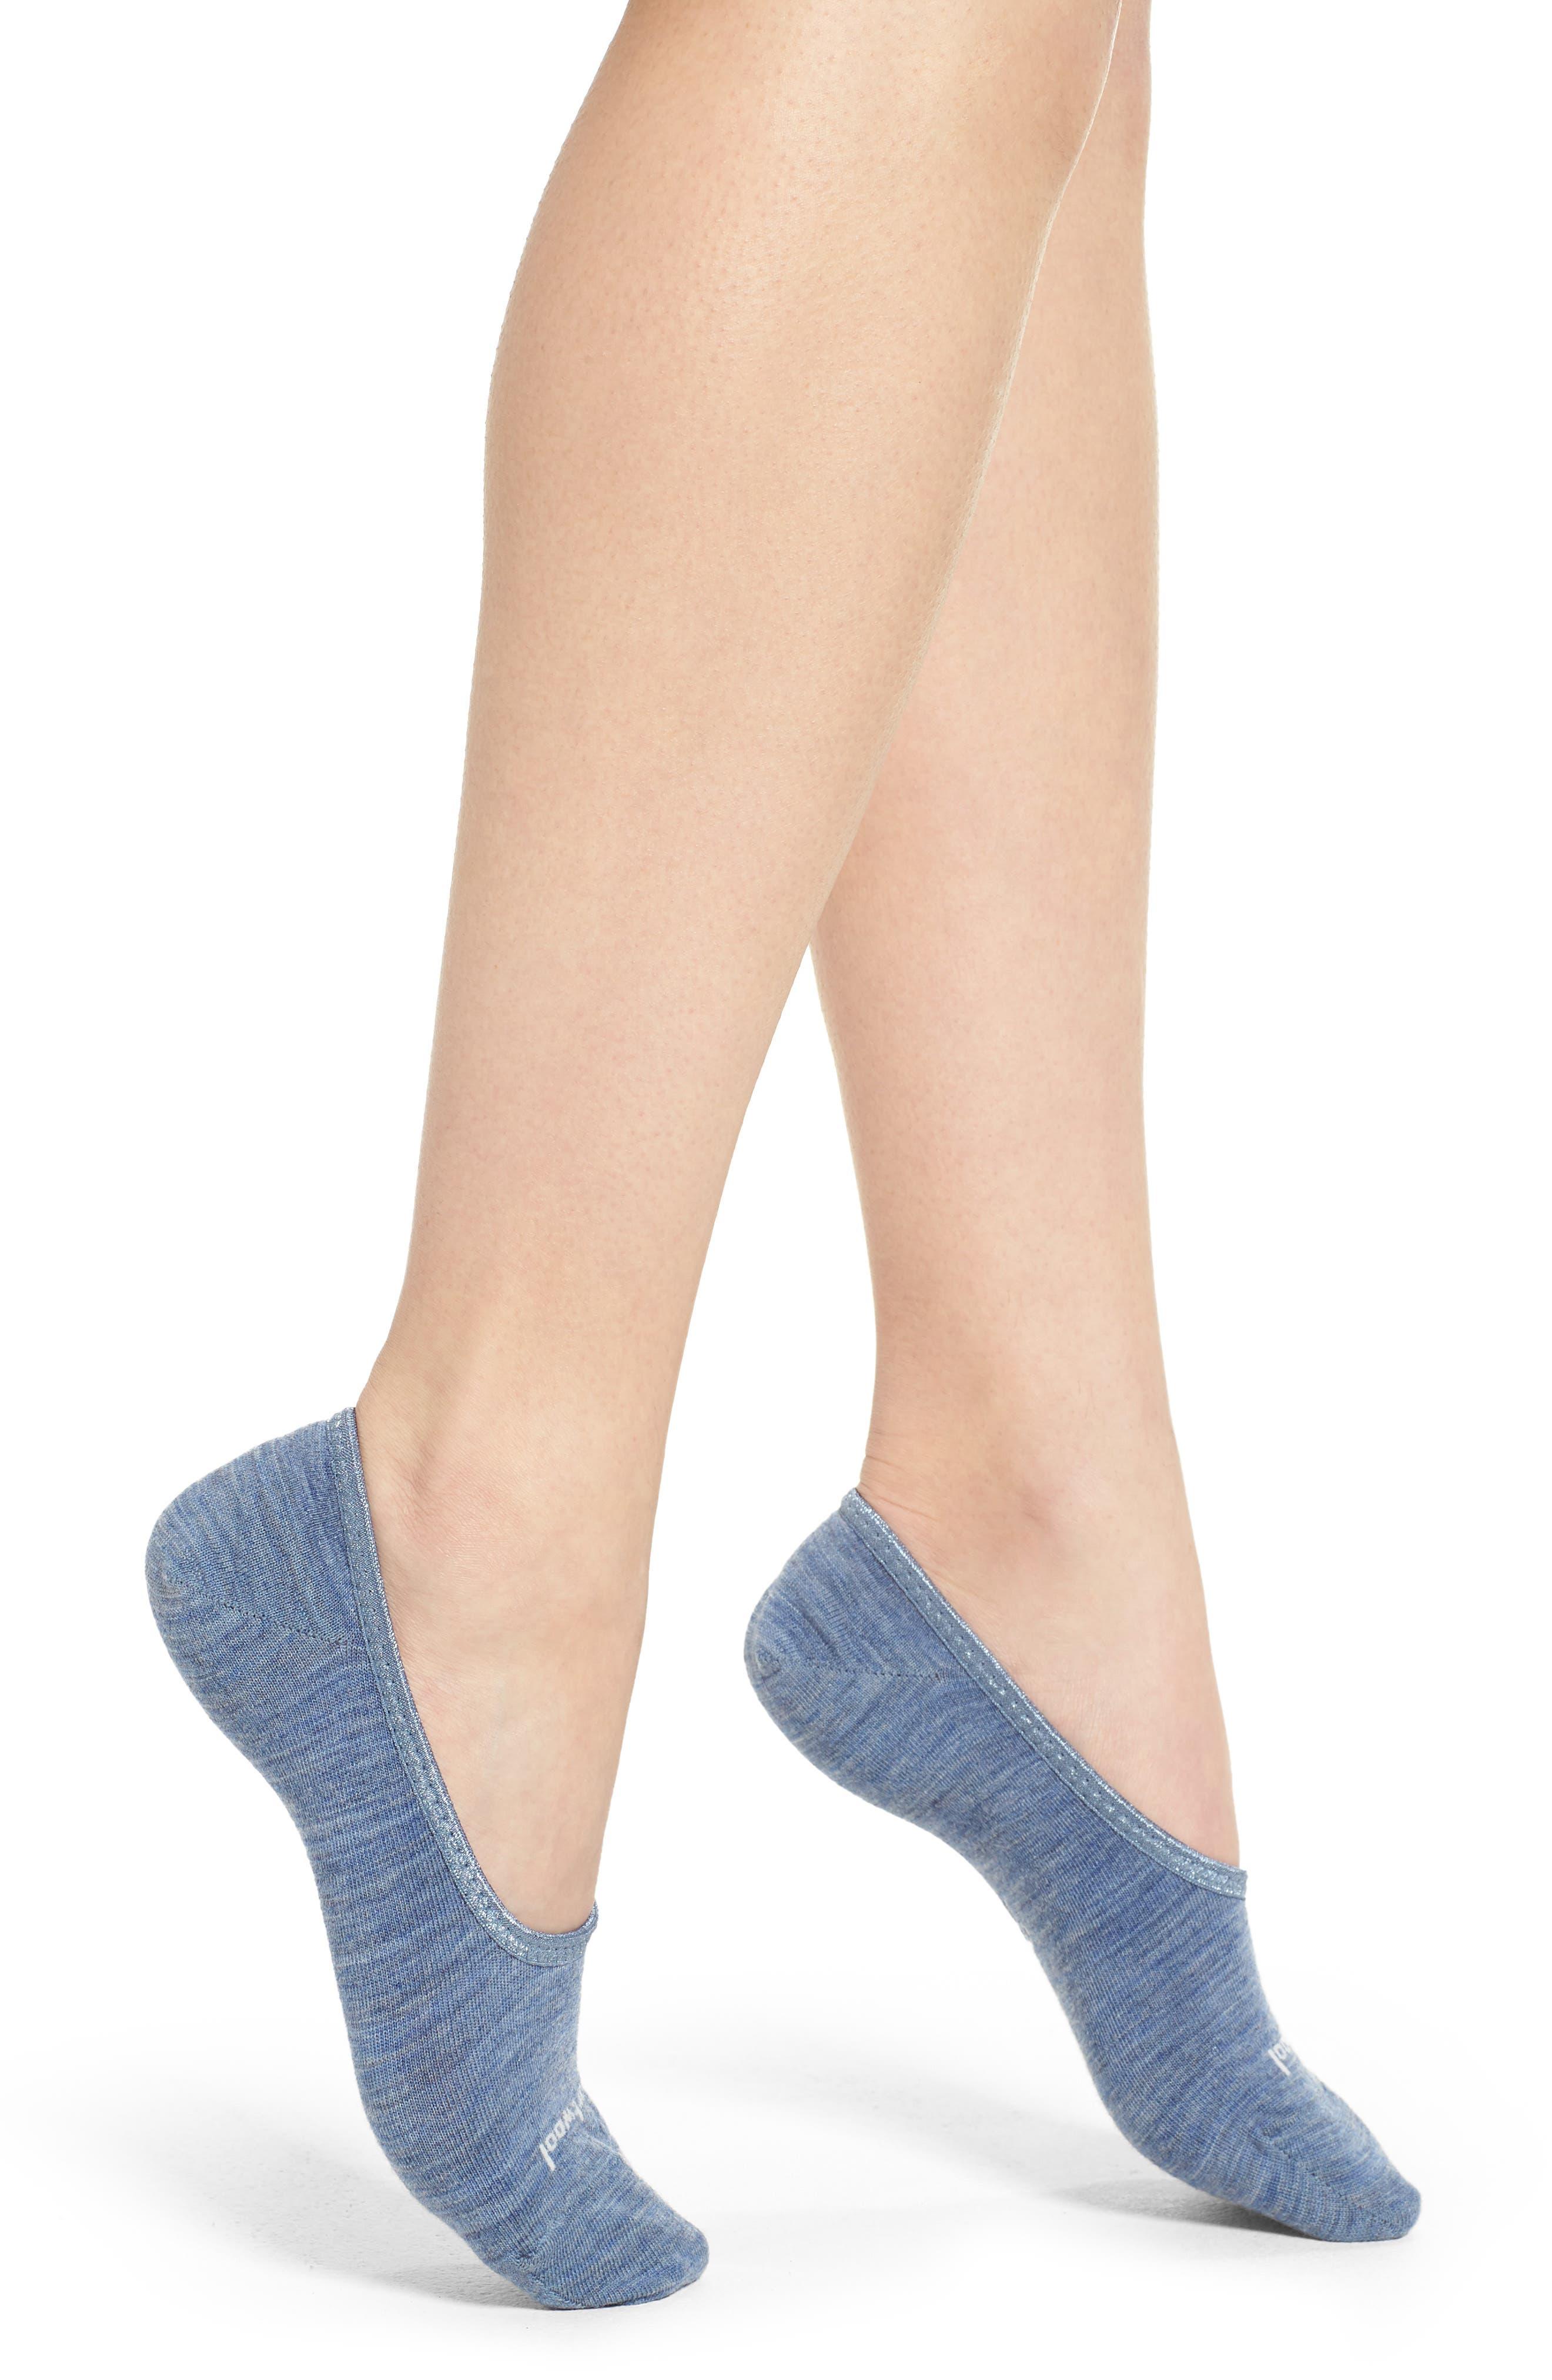 'Hide and Seek' No-Show Socks,                             Main thumbnail 1, color,                             Blue Steel